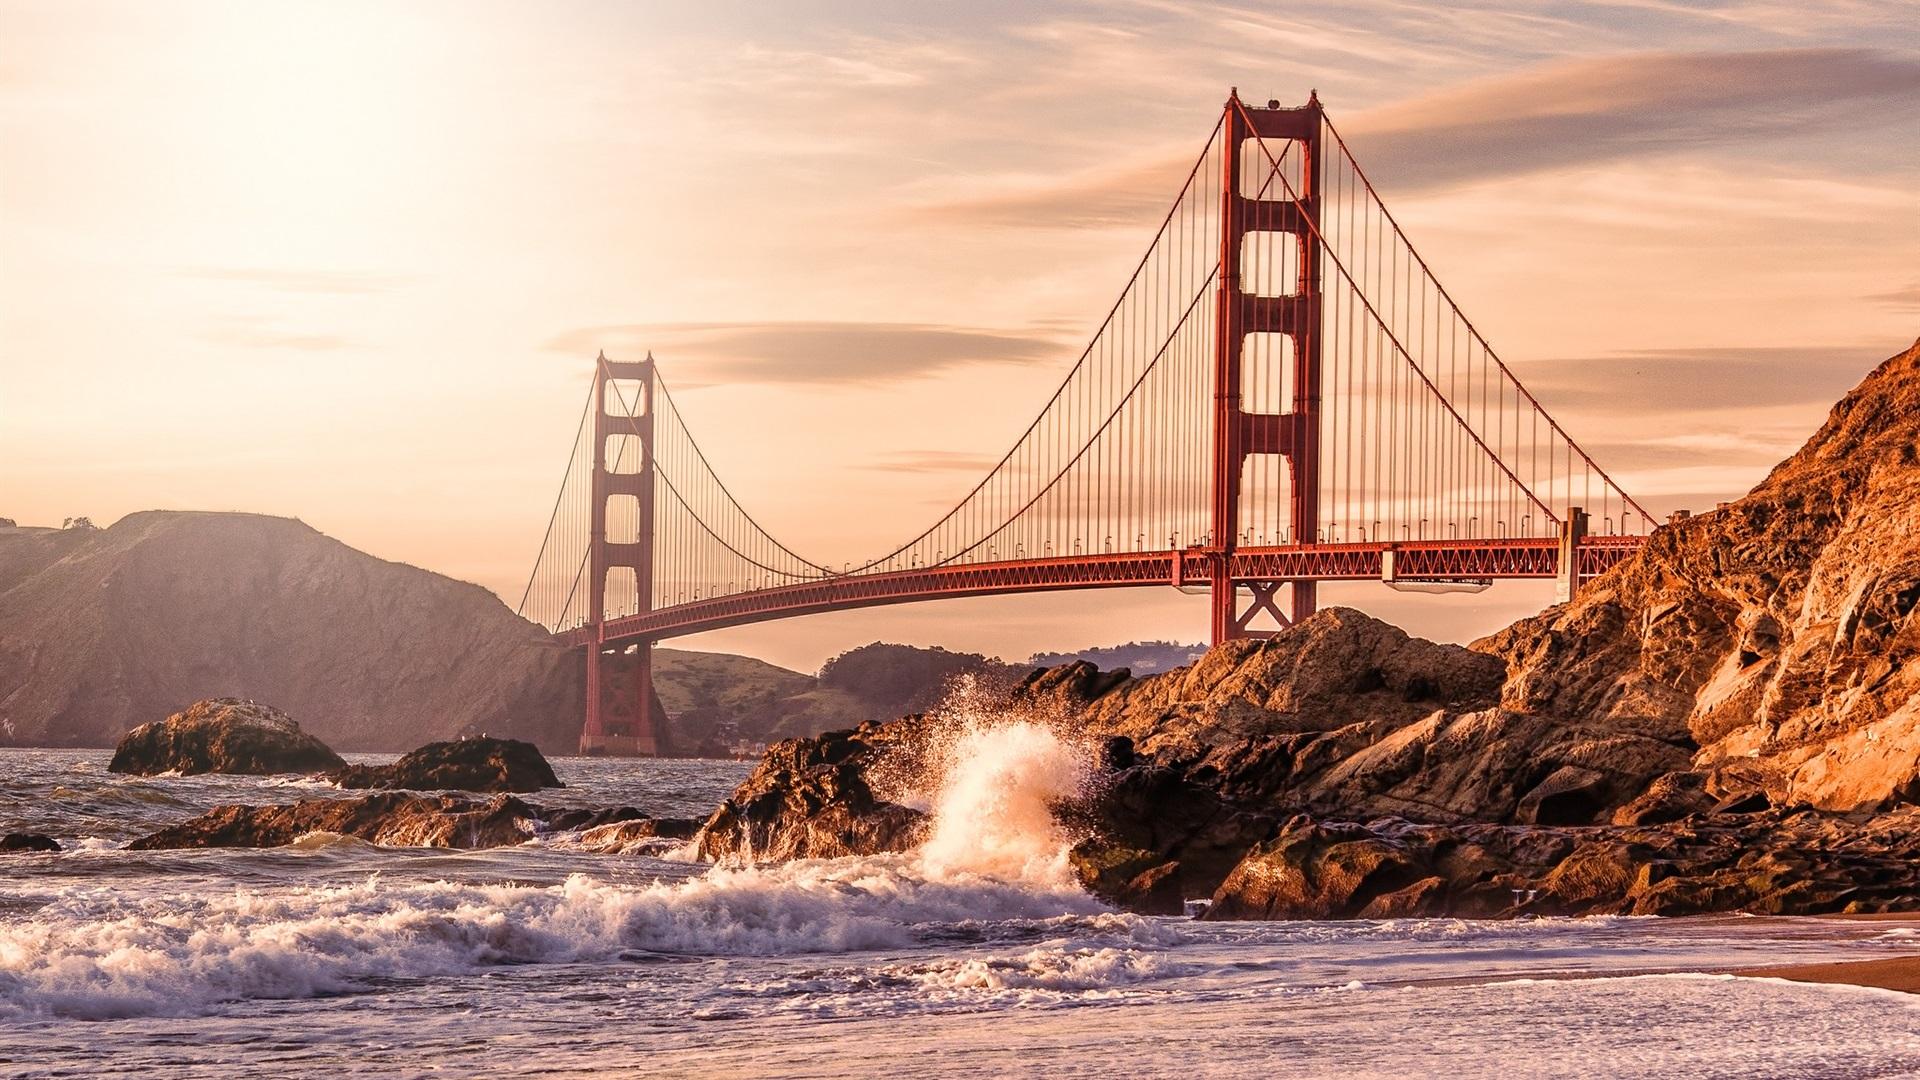 Wallpaper Usa San Francisco Golden Gate Bridge Rocks Waves Beach 1920x1200 Hd Picture Image